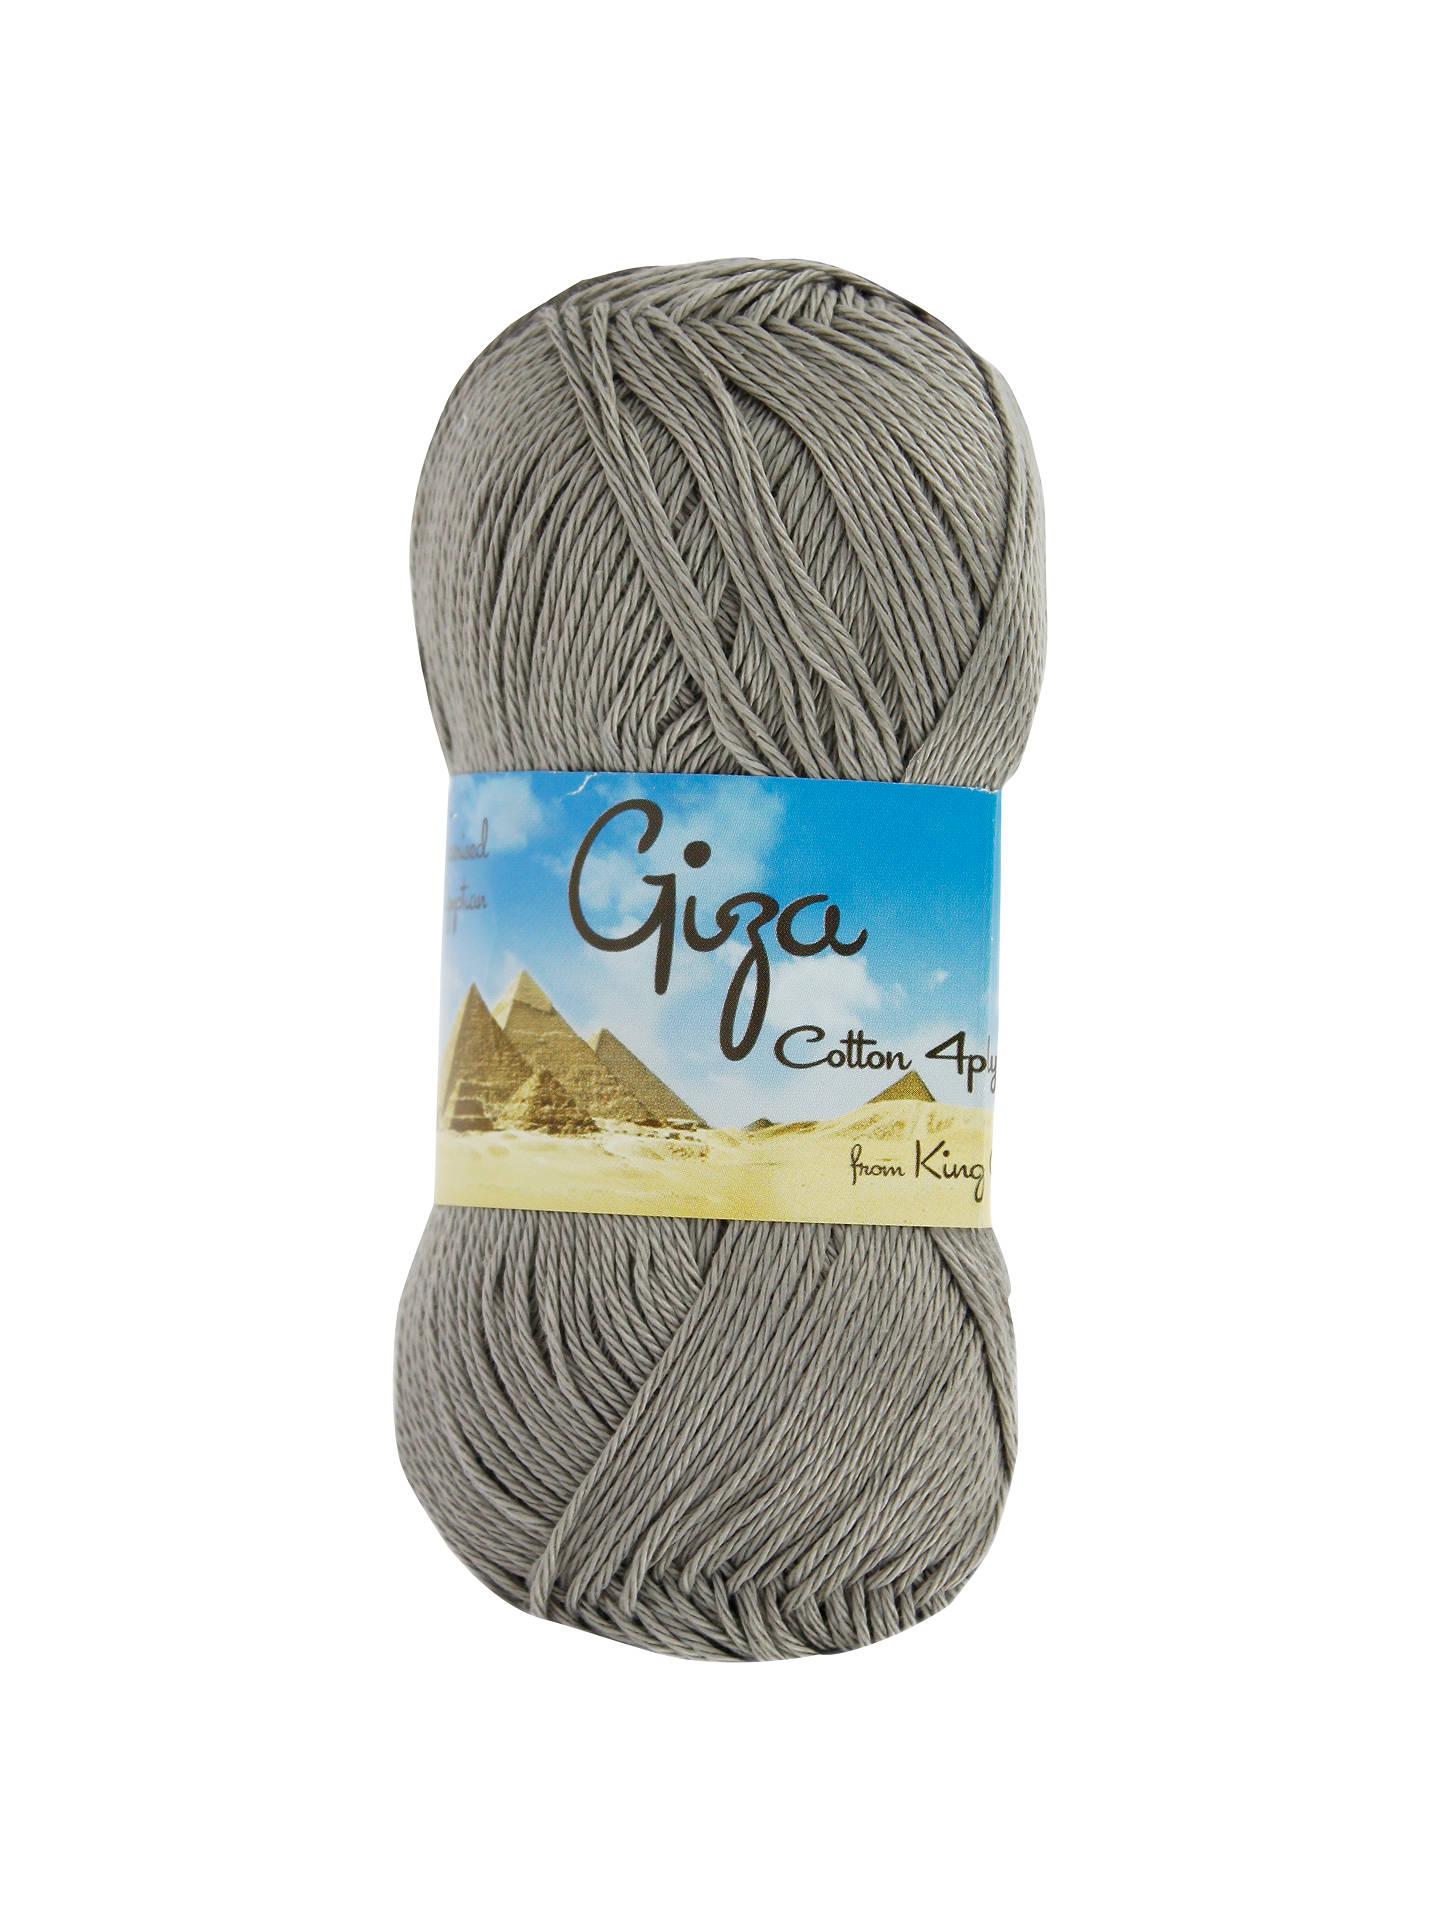 King Cole Giza Cotton 4 Ply Yarn 50g At John Lewis Partners